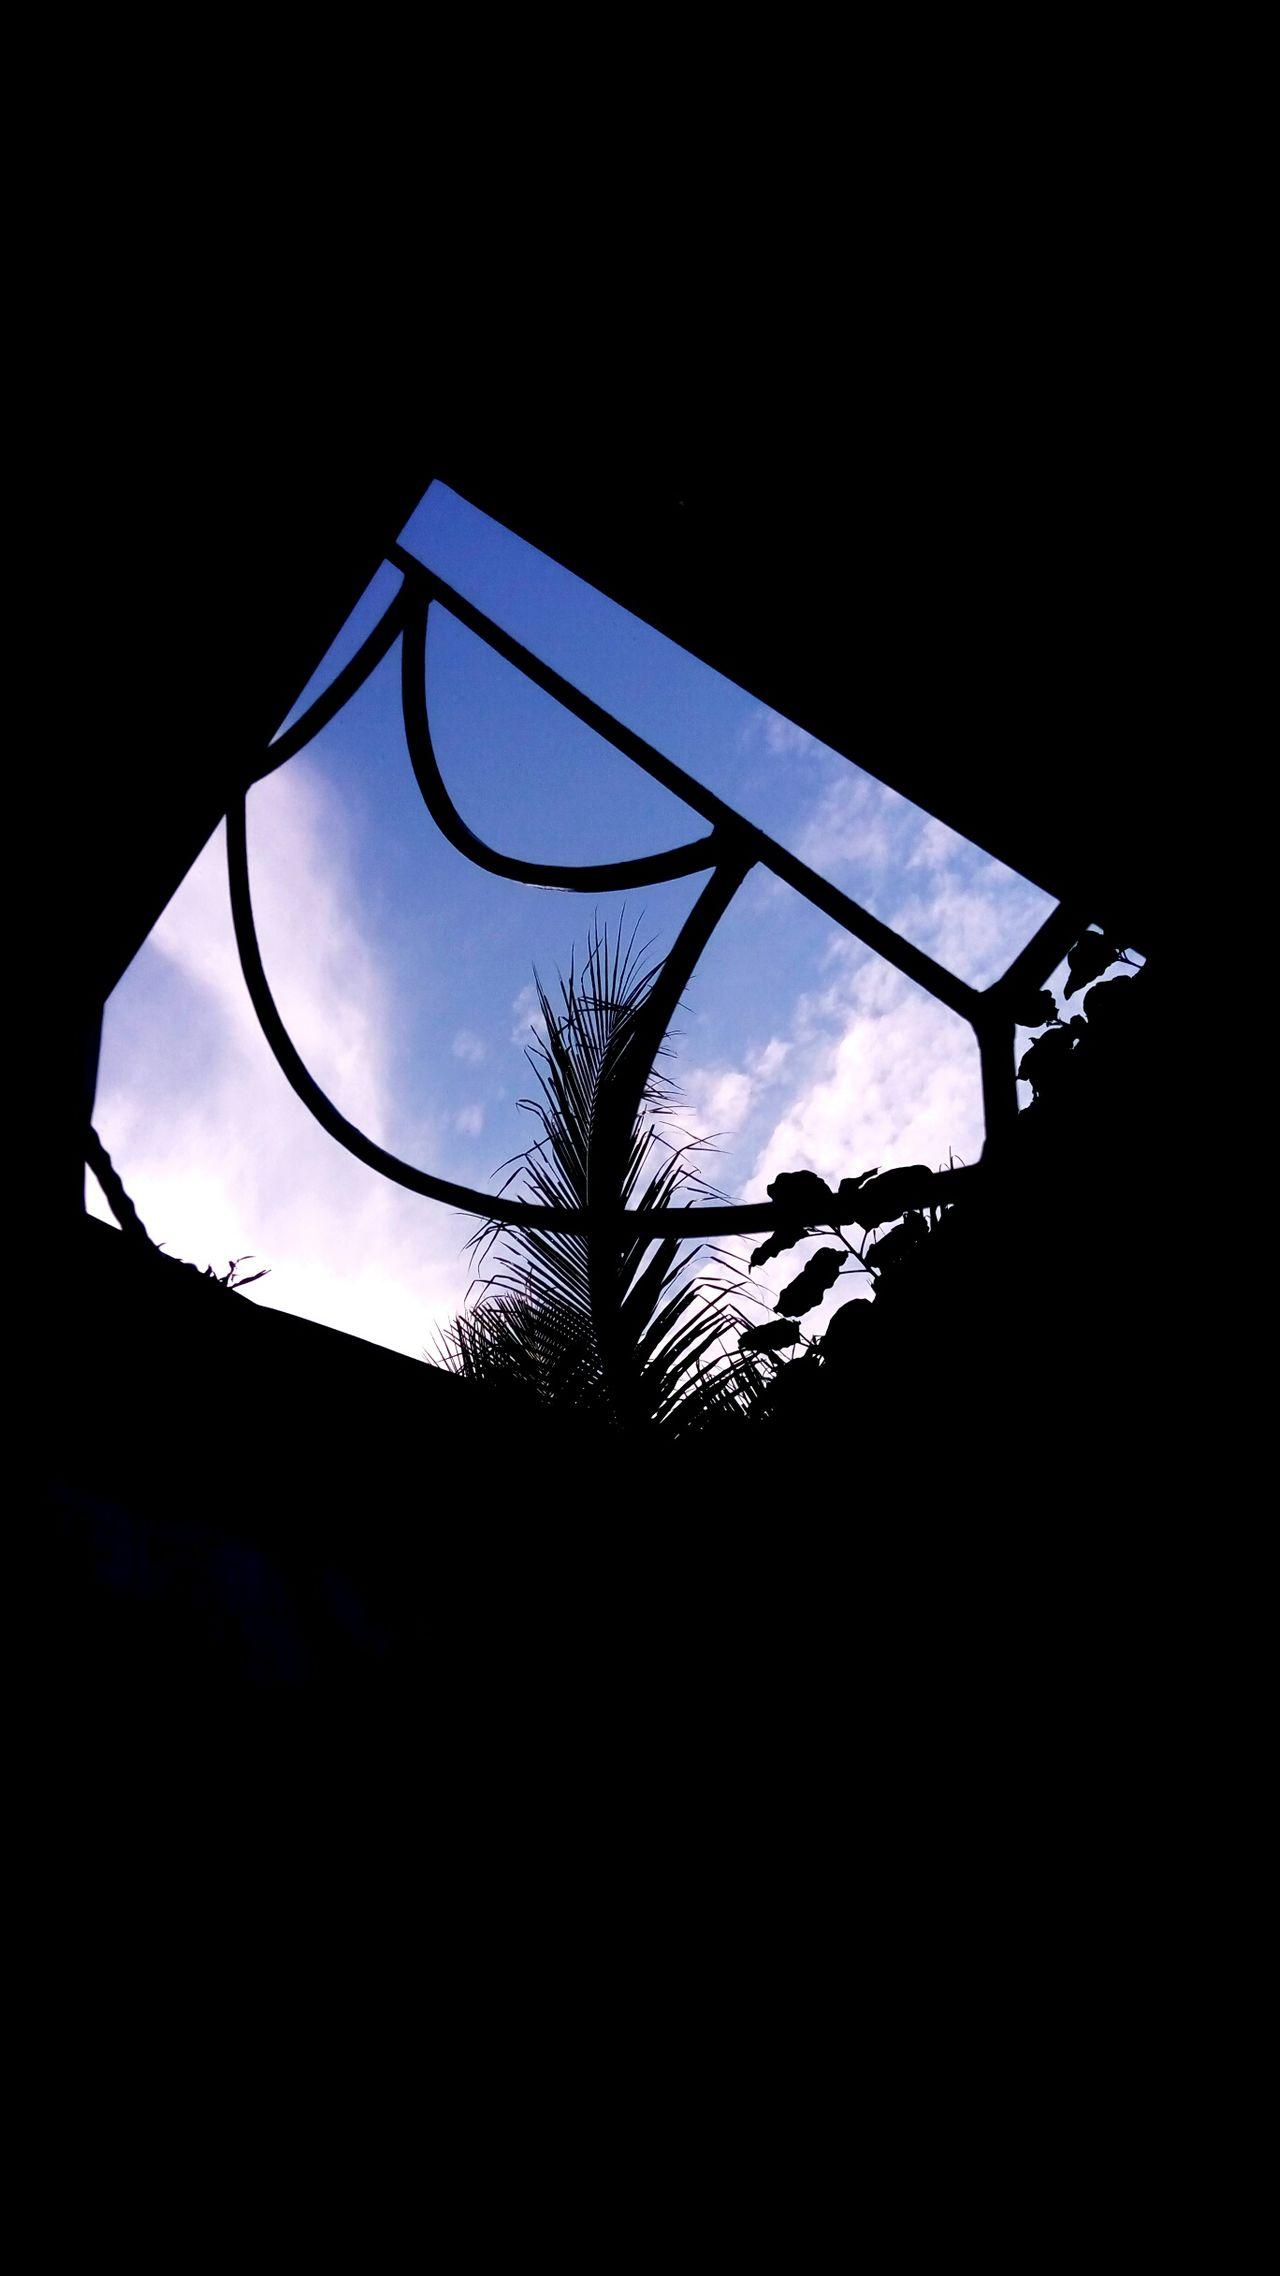 Window Morning Sky Morning Light Eyeem Morning View Morning View Darkness And Light 27-03-2k17